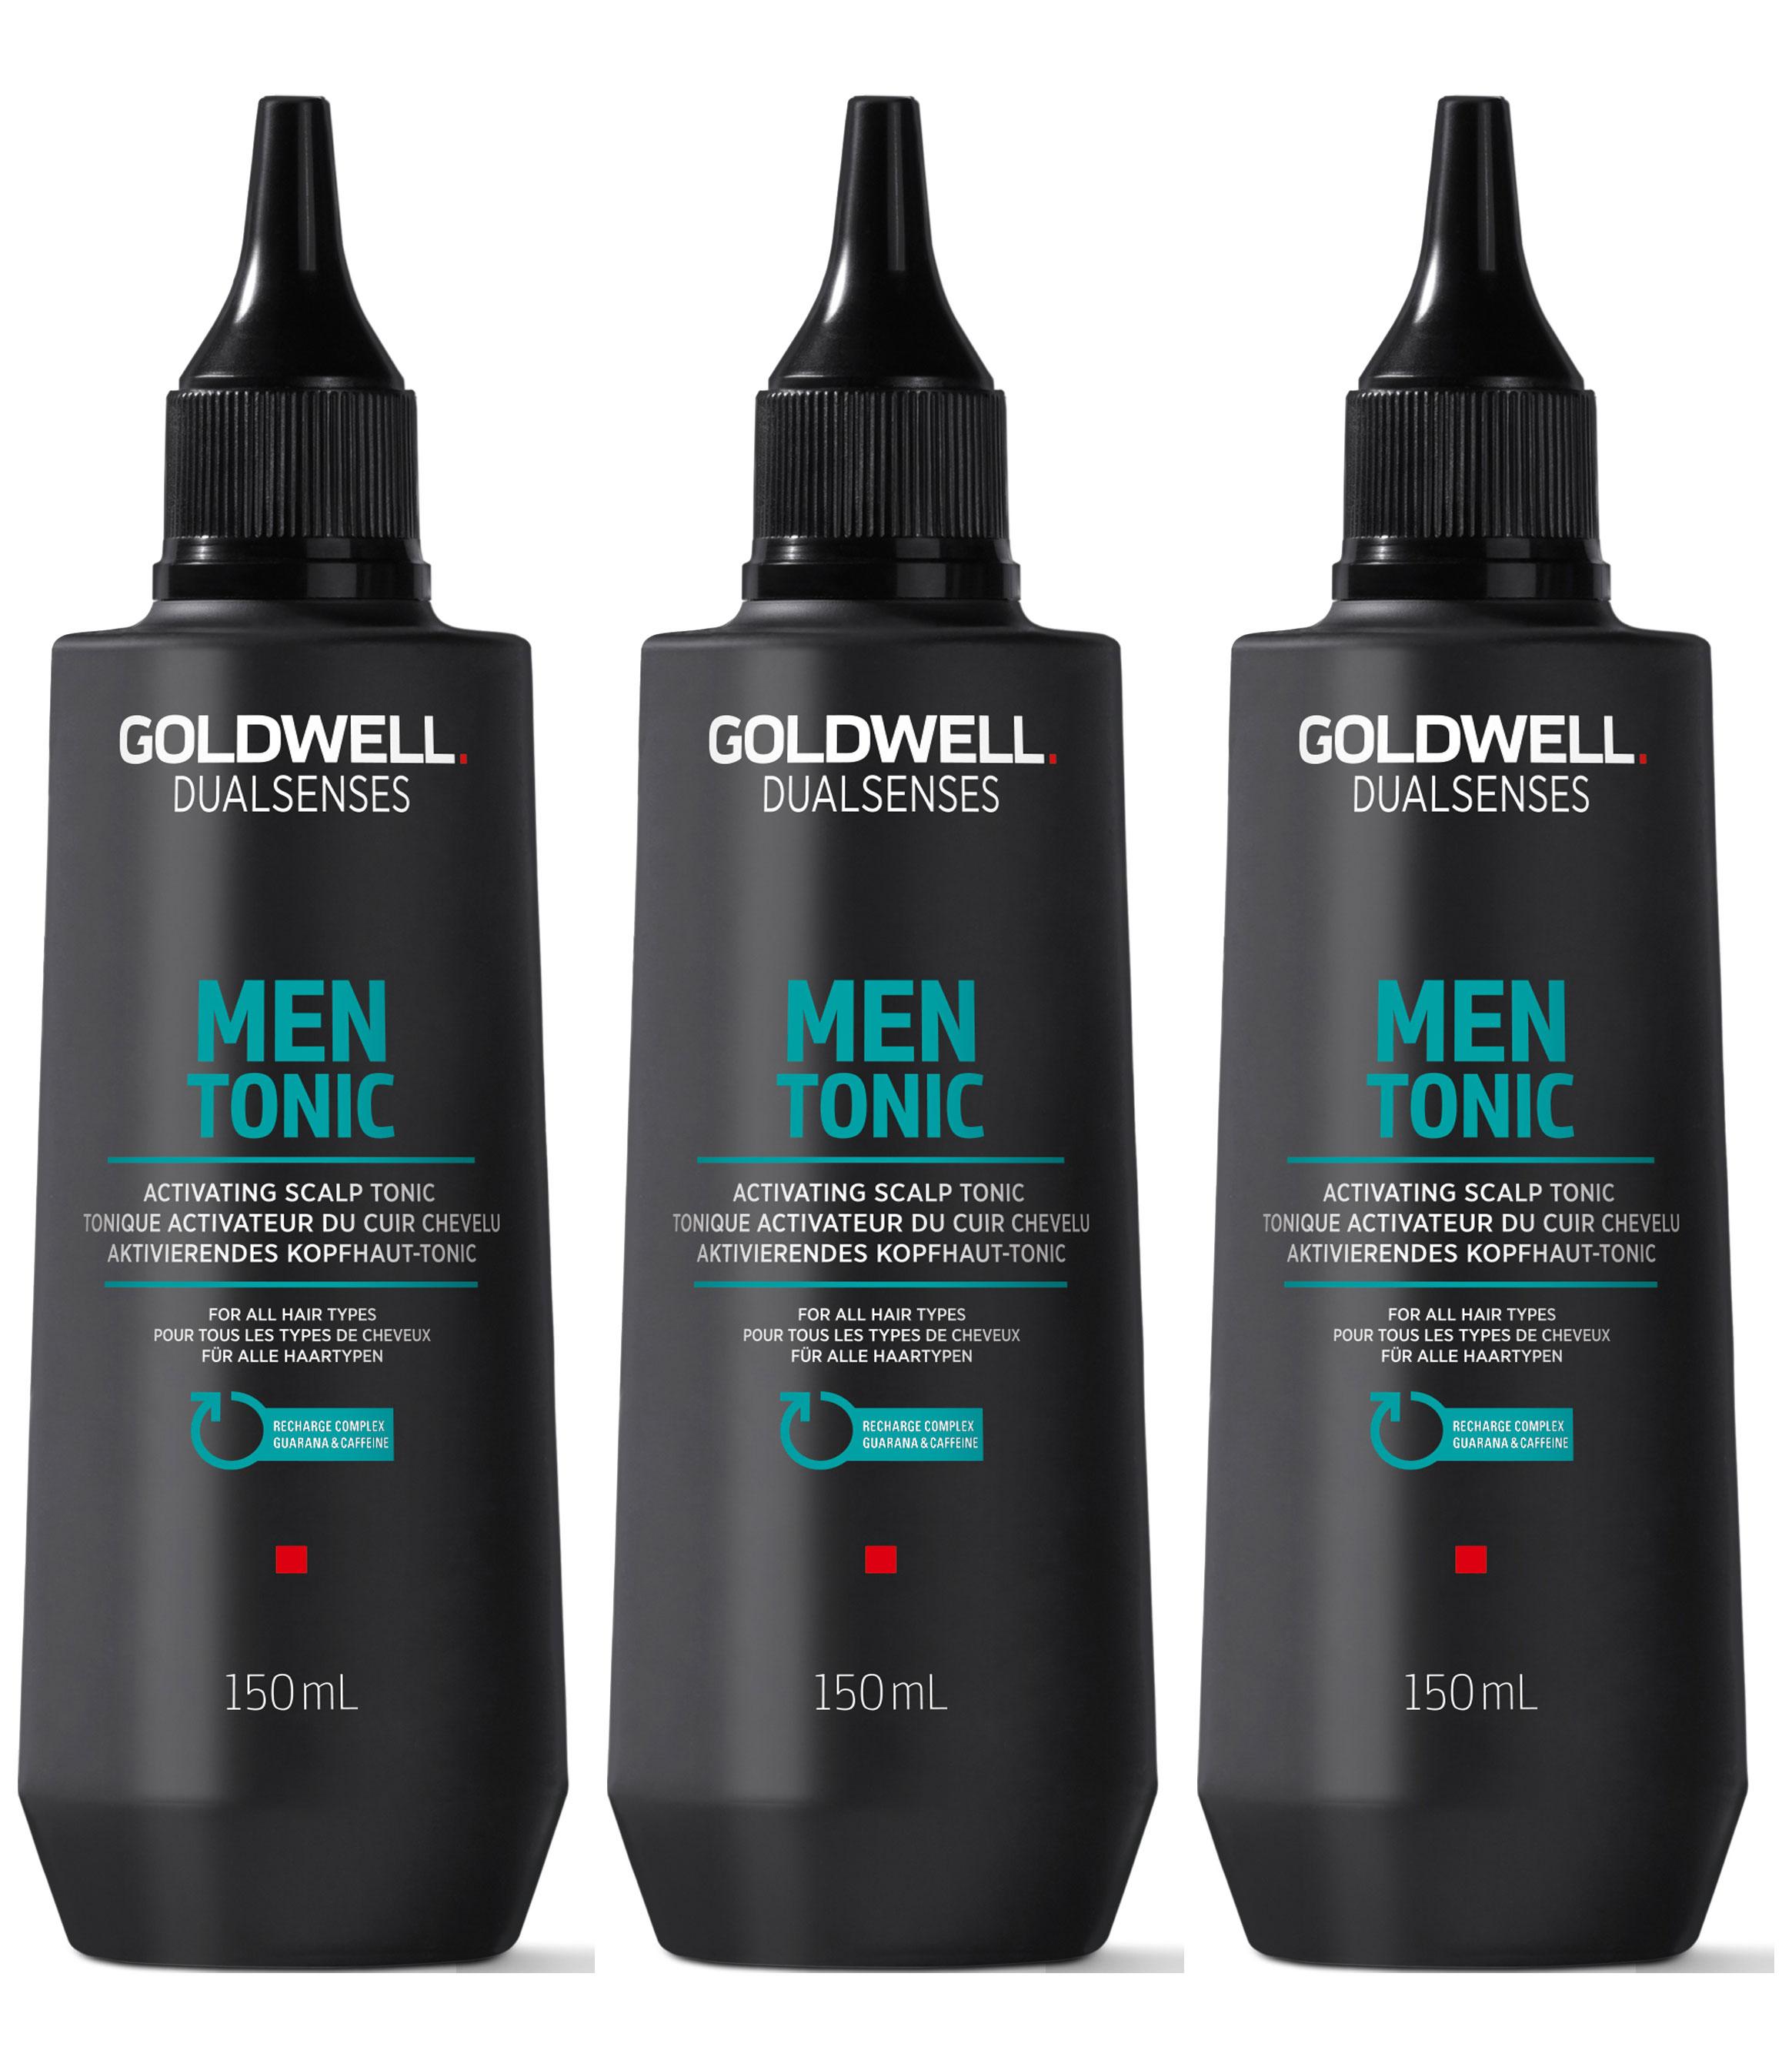 Goldwell Dualsenses For Men Activating Scalp Tonic 3 x 150ml = 450ml